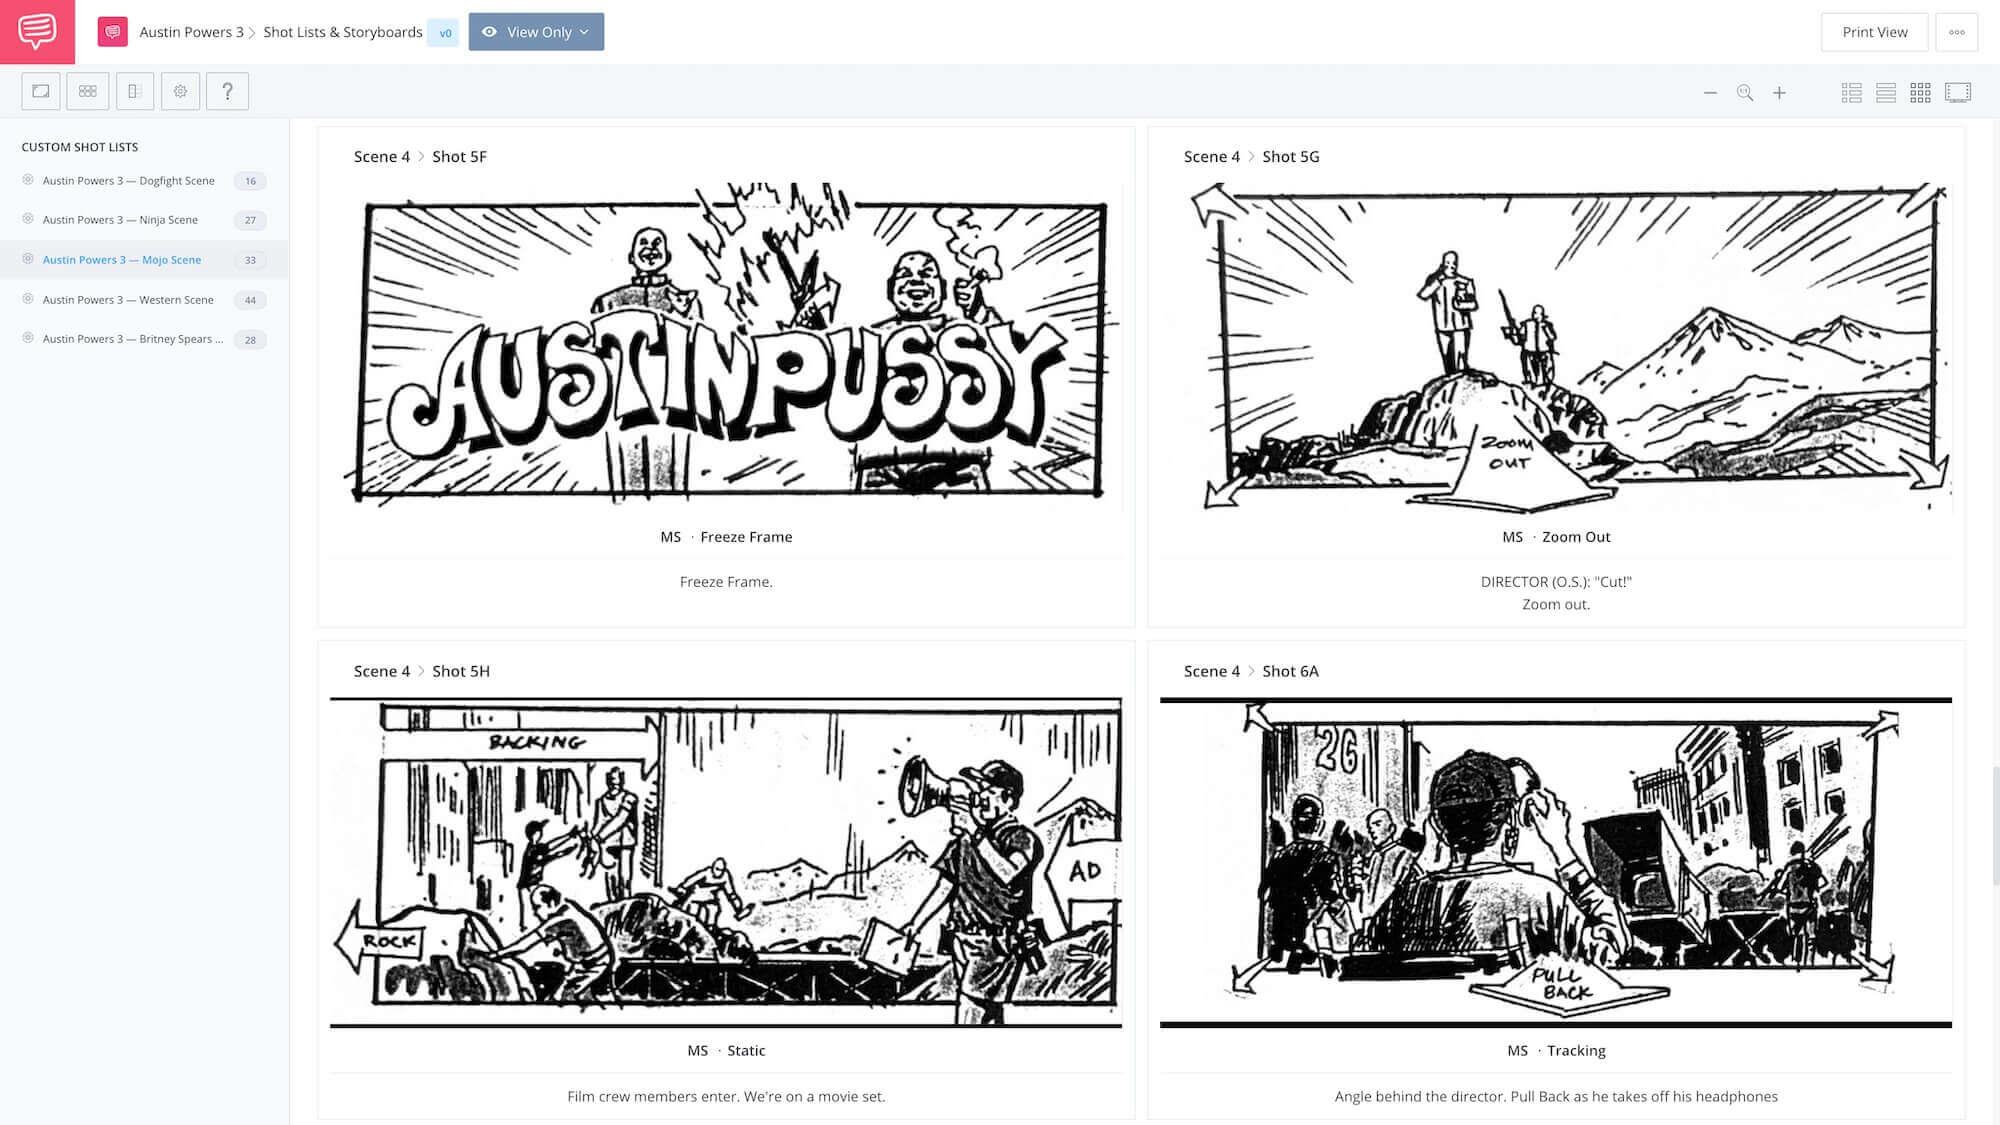 Austin Powers 3 - Movie Within a Movie Director Scene App Tie-In - StudioBinder